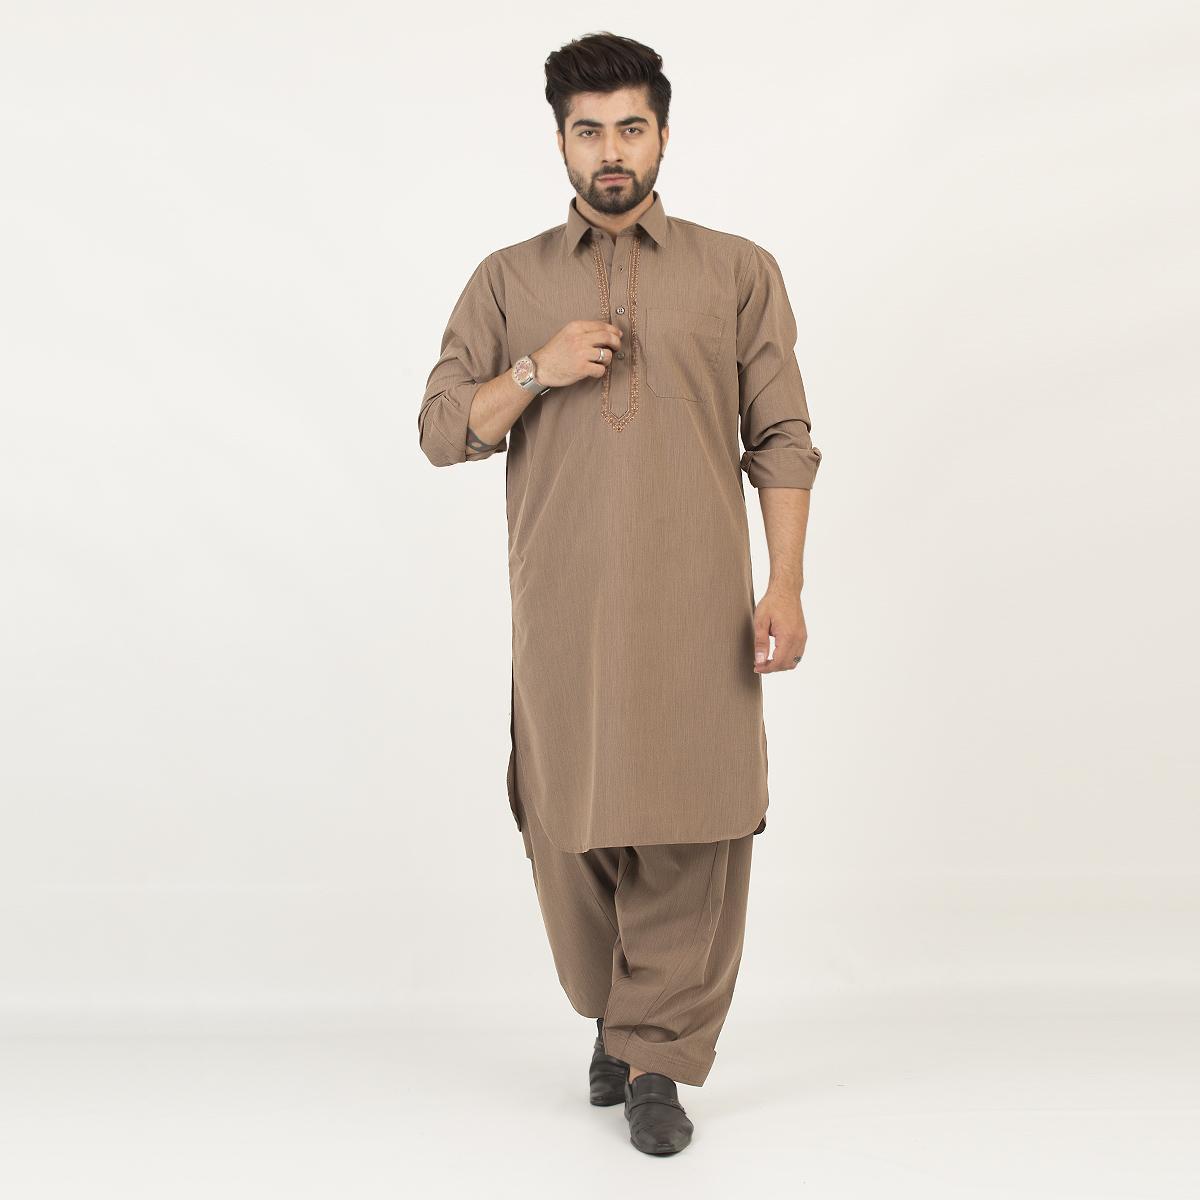 178 Cut Price Shalwar Qameez Suit Shirt Collar Embroidery for Men Greenish Brown